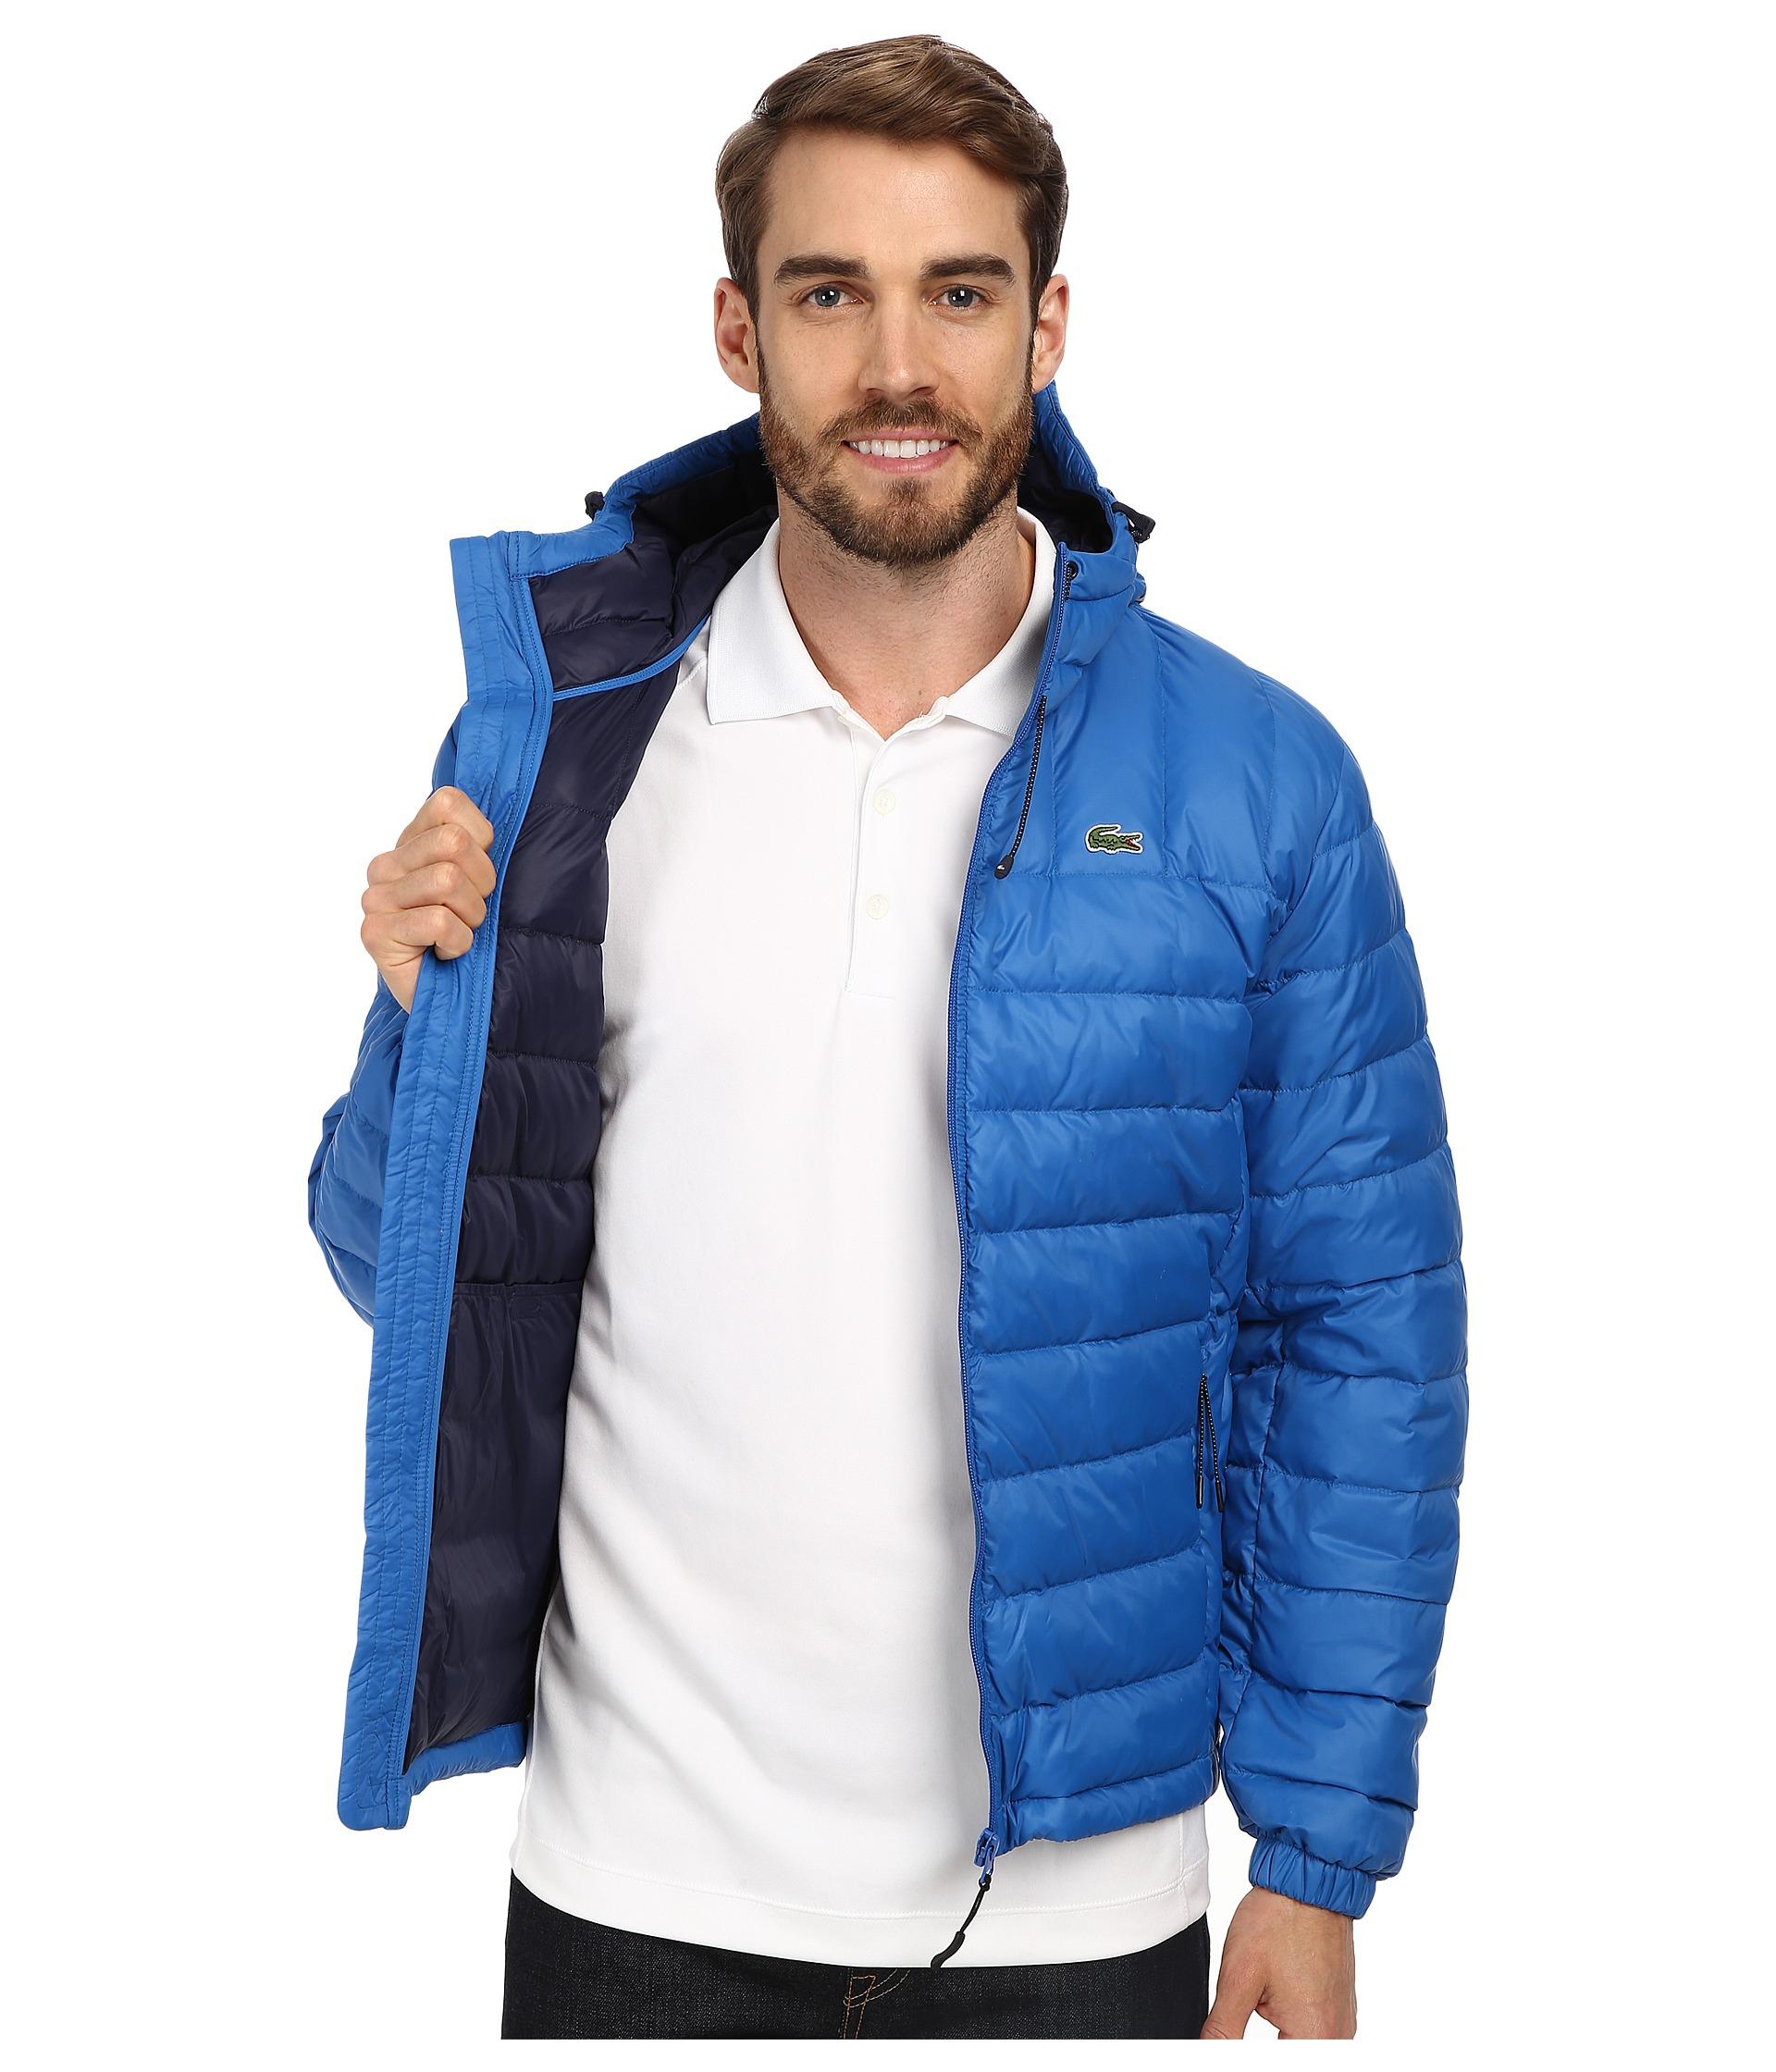 7dd35d832 Lyst - Lacoste Packable Down Jacket in Blue for Men